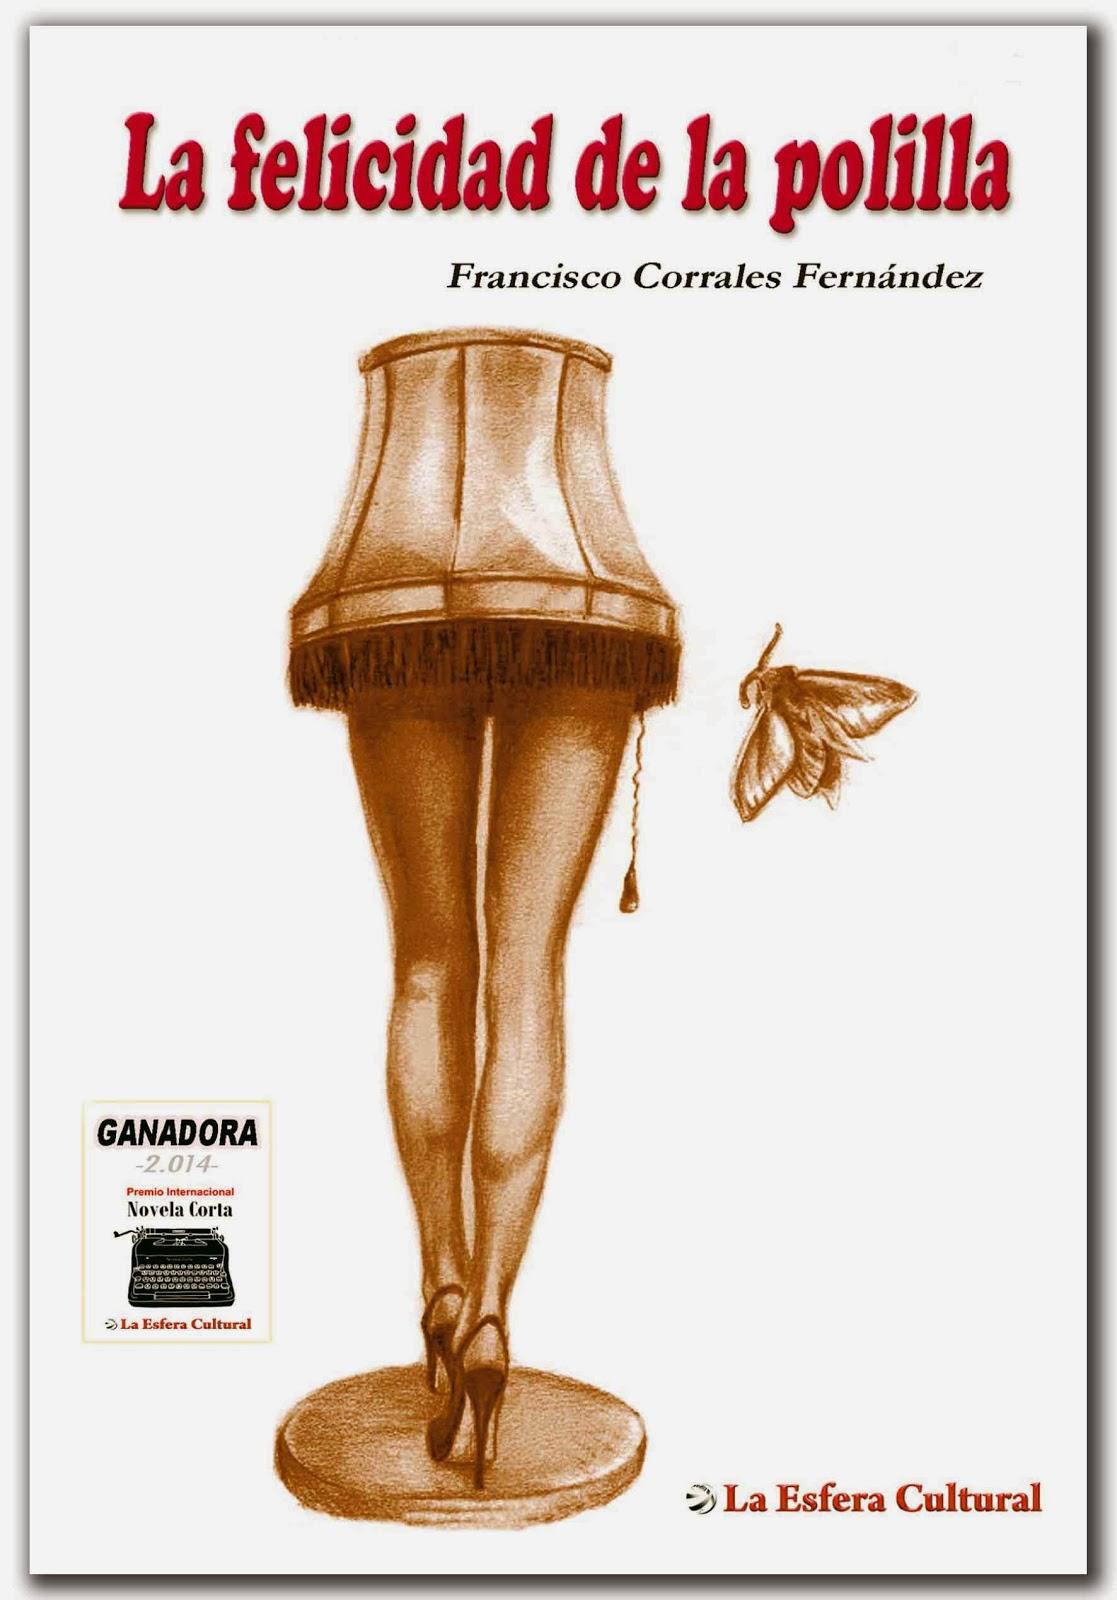 premio, novela corta, Francisco Corrales